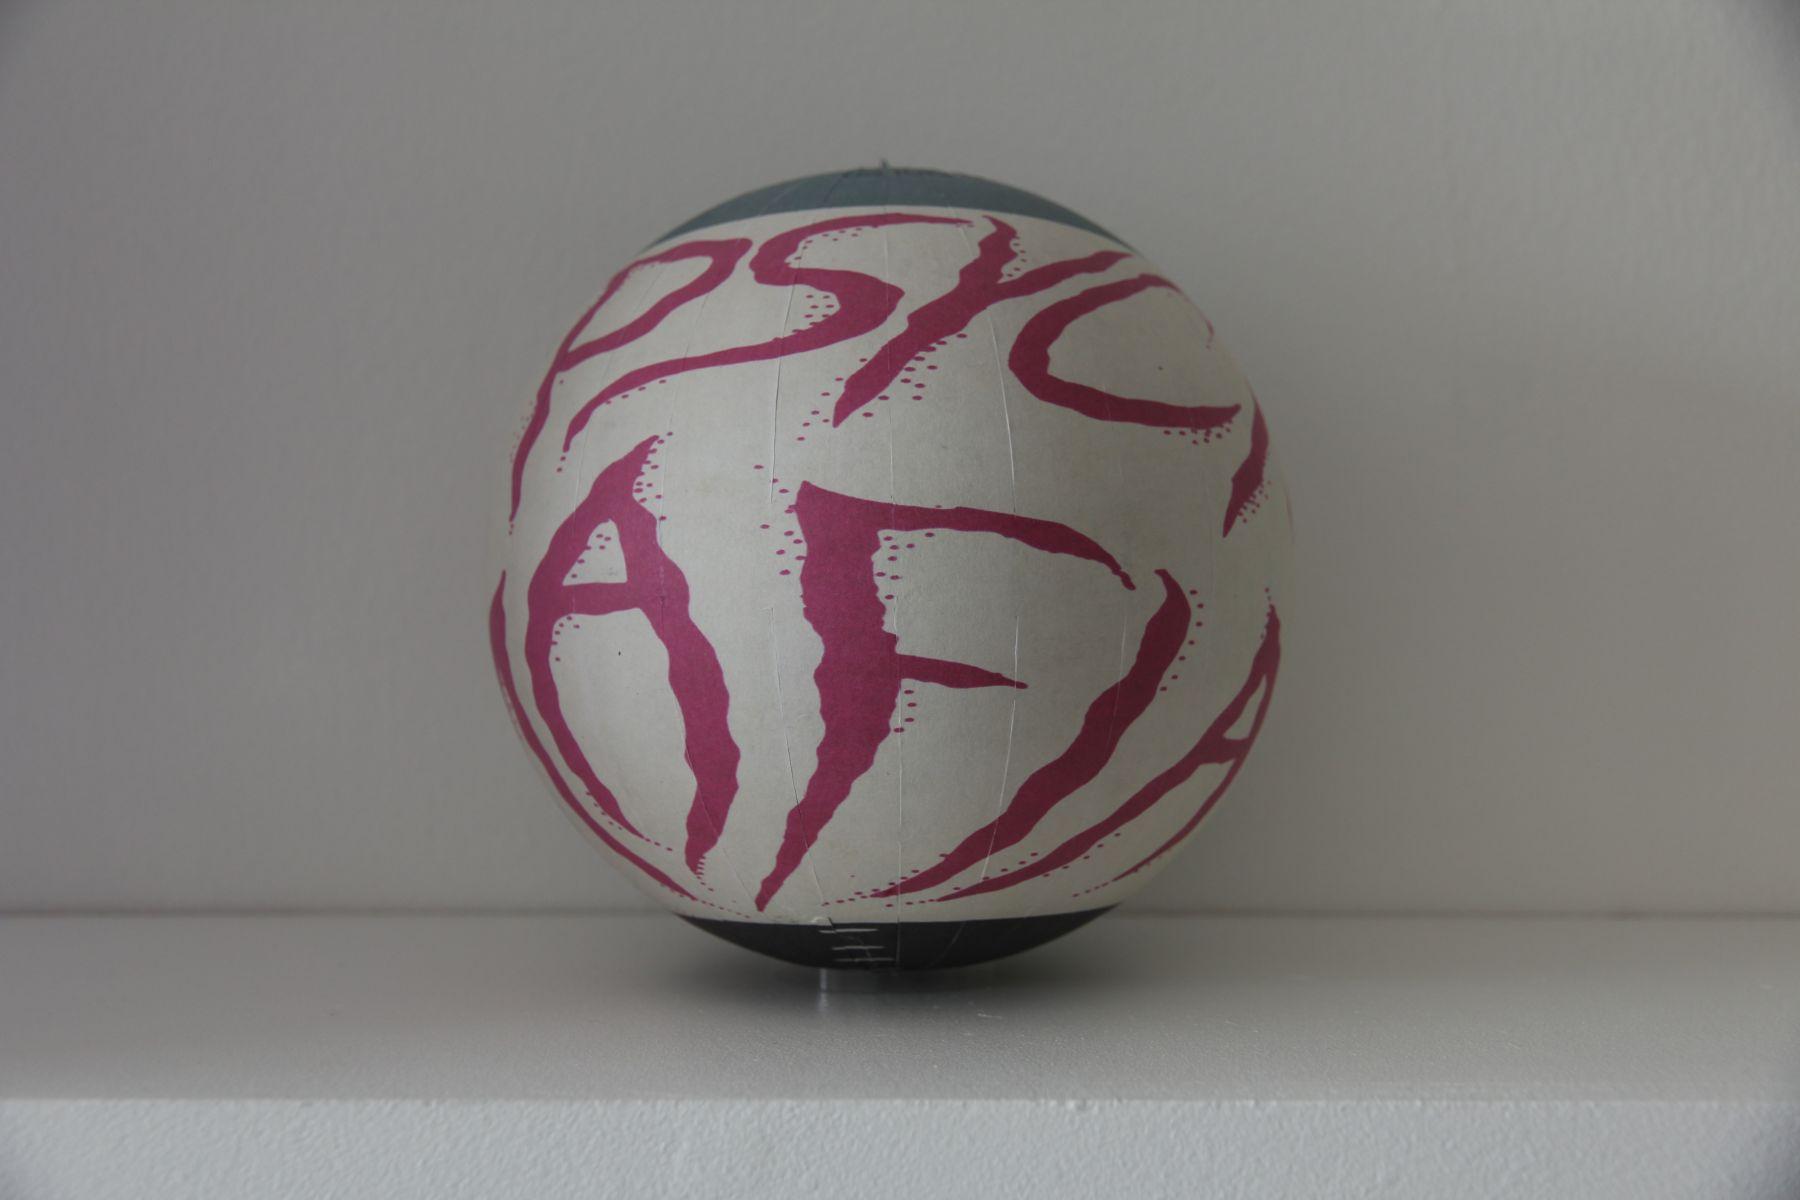 SUSAN MACWILLIAM  The Psychic Mafia  2013/2014, inkjet paper, plastic sphere, 6 x 6 x 6 inches